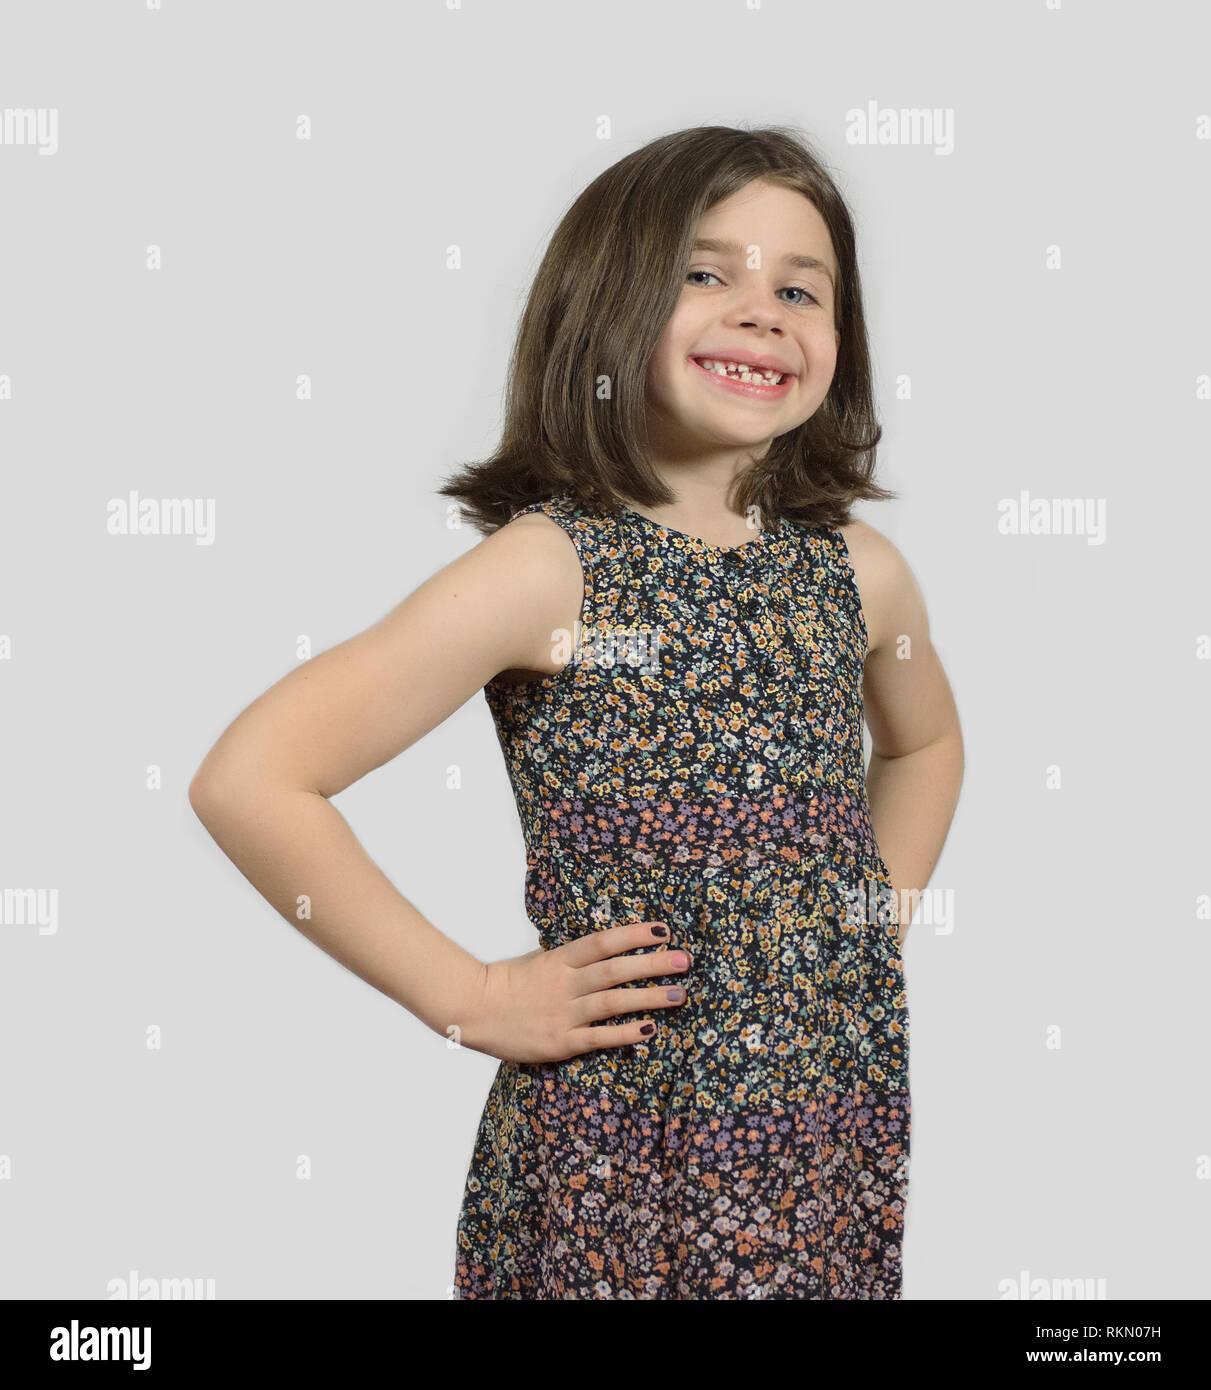 Headshot of smiling little girl with short bob hair cut